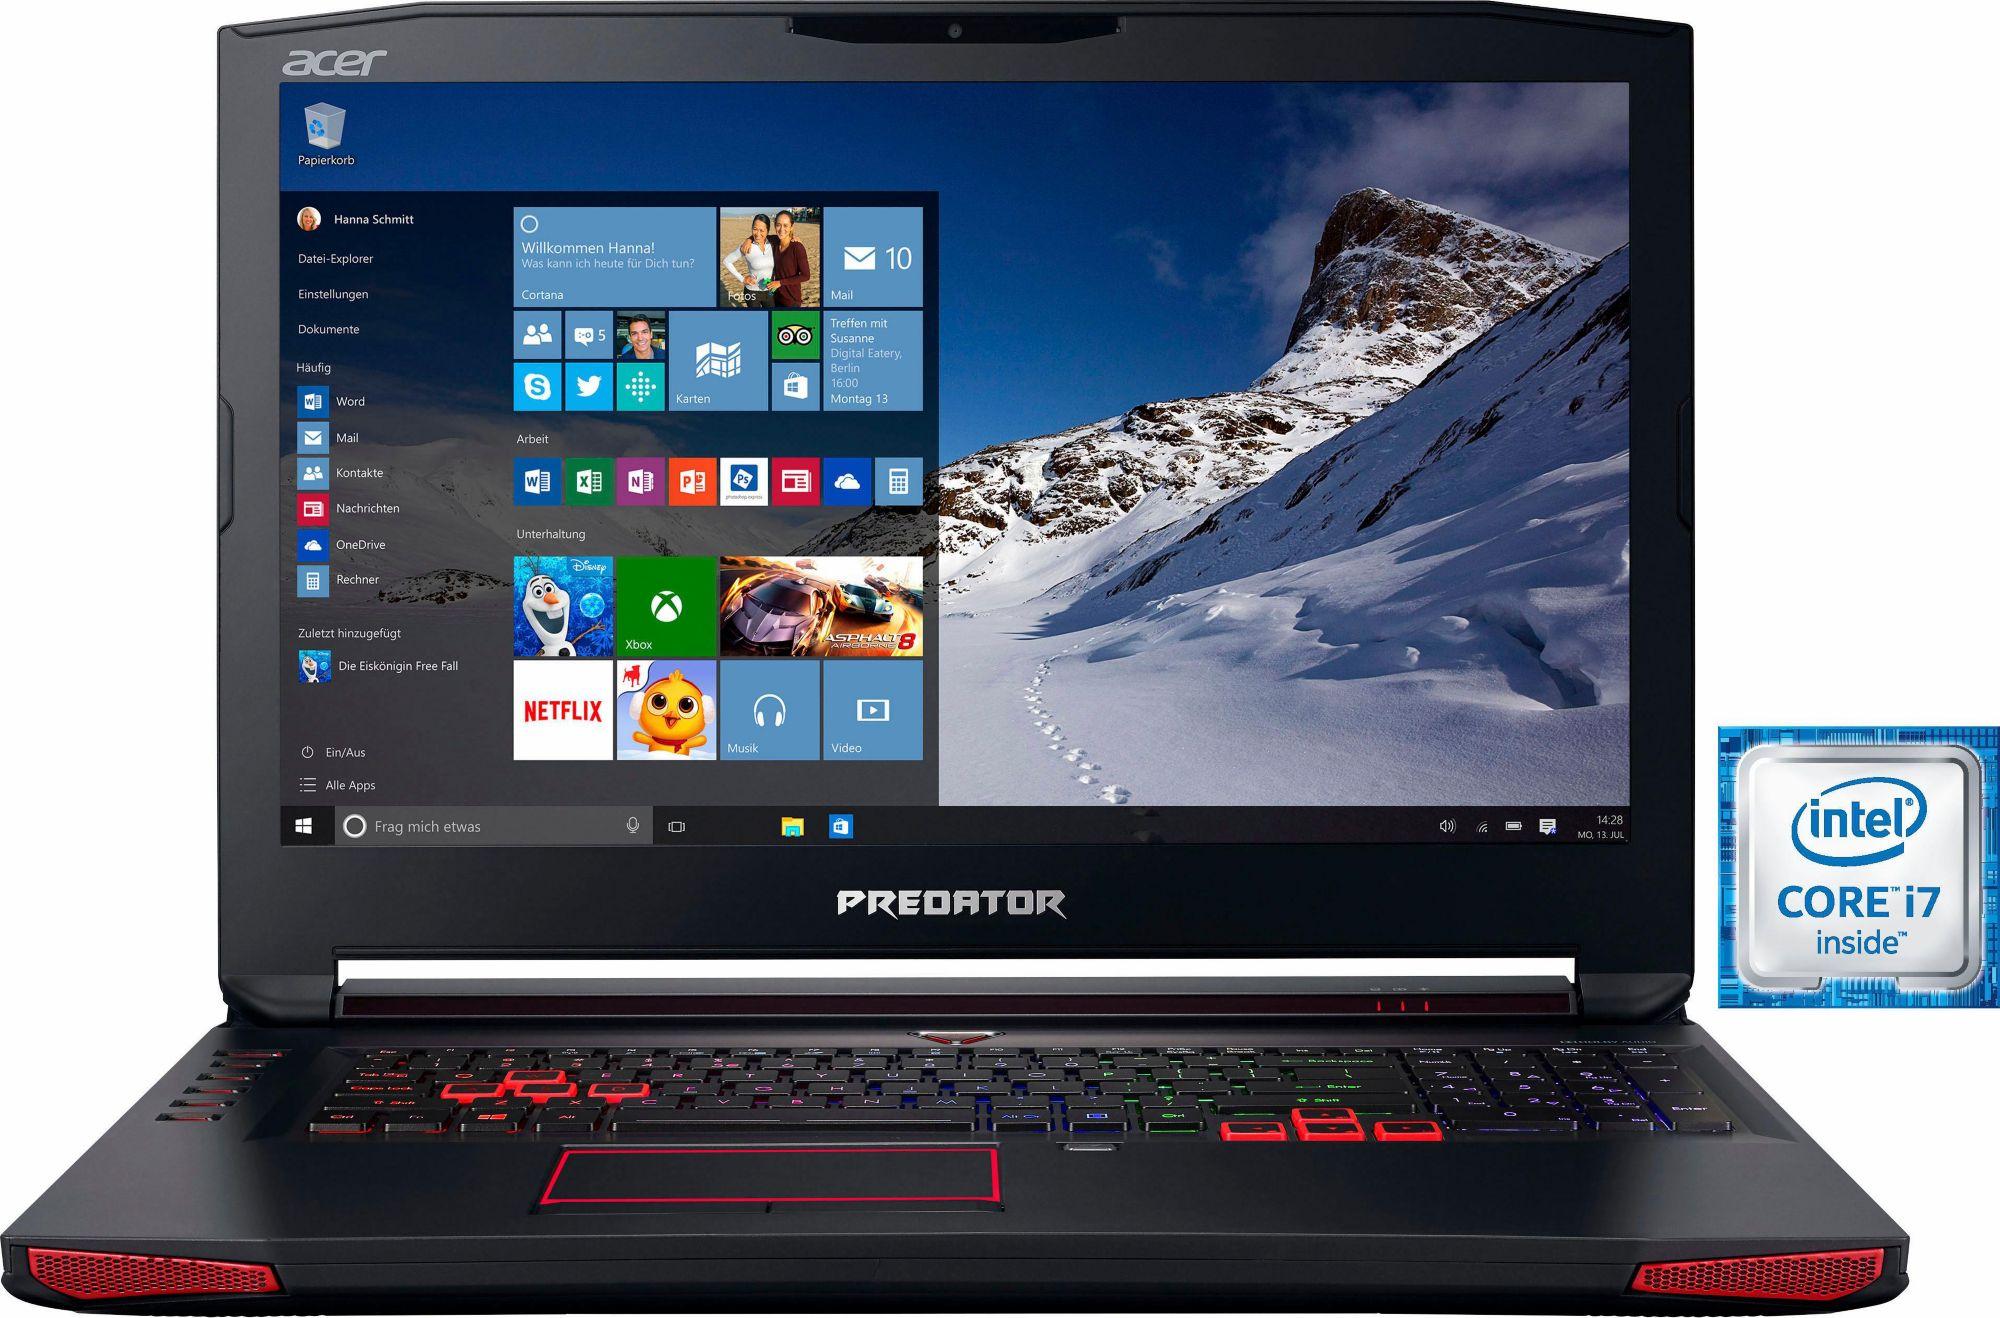 ACER Acer Predator 17 (G9-793-77LN) Notebook, Intel® Core? i7, 43,9 cm (17,3 Zoll), 1512 GB Speicher